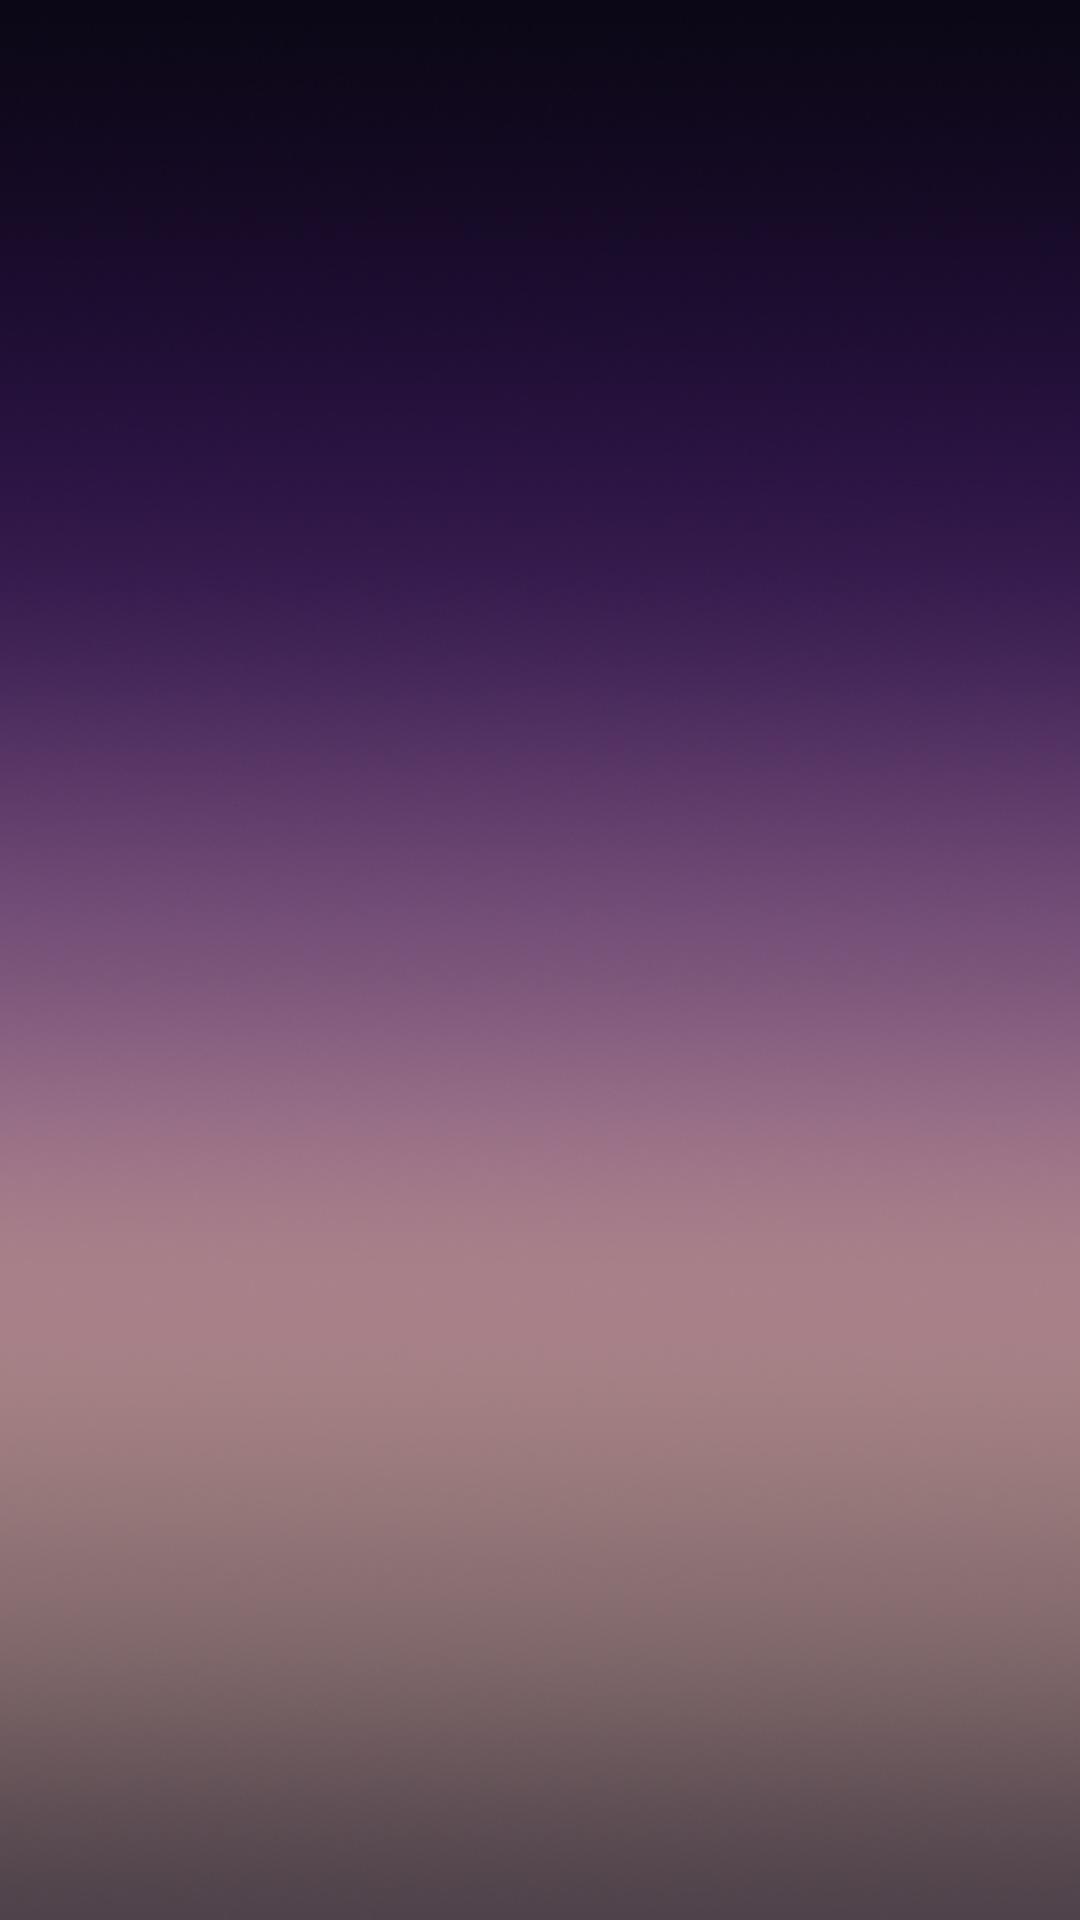 Ga galaxy s8 wallpaper stock - Mauve Wallpaper Galaxy Clean Beauty Colour Peaceful Calming